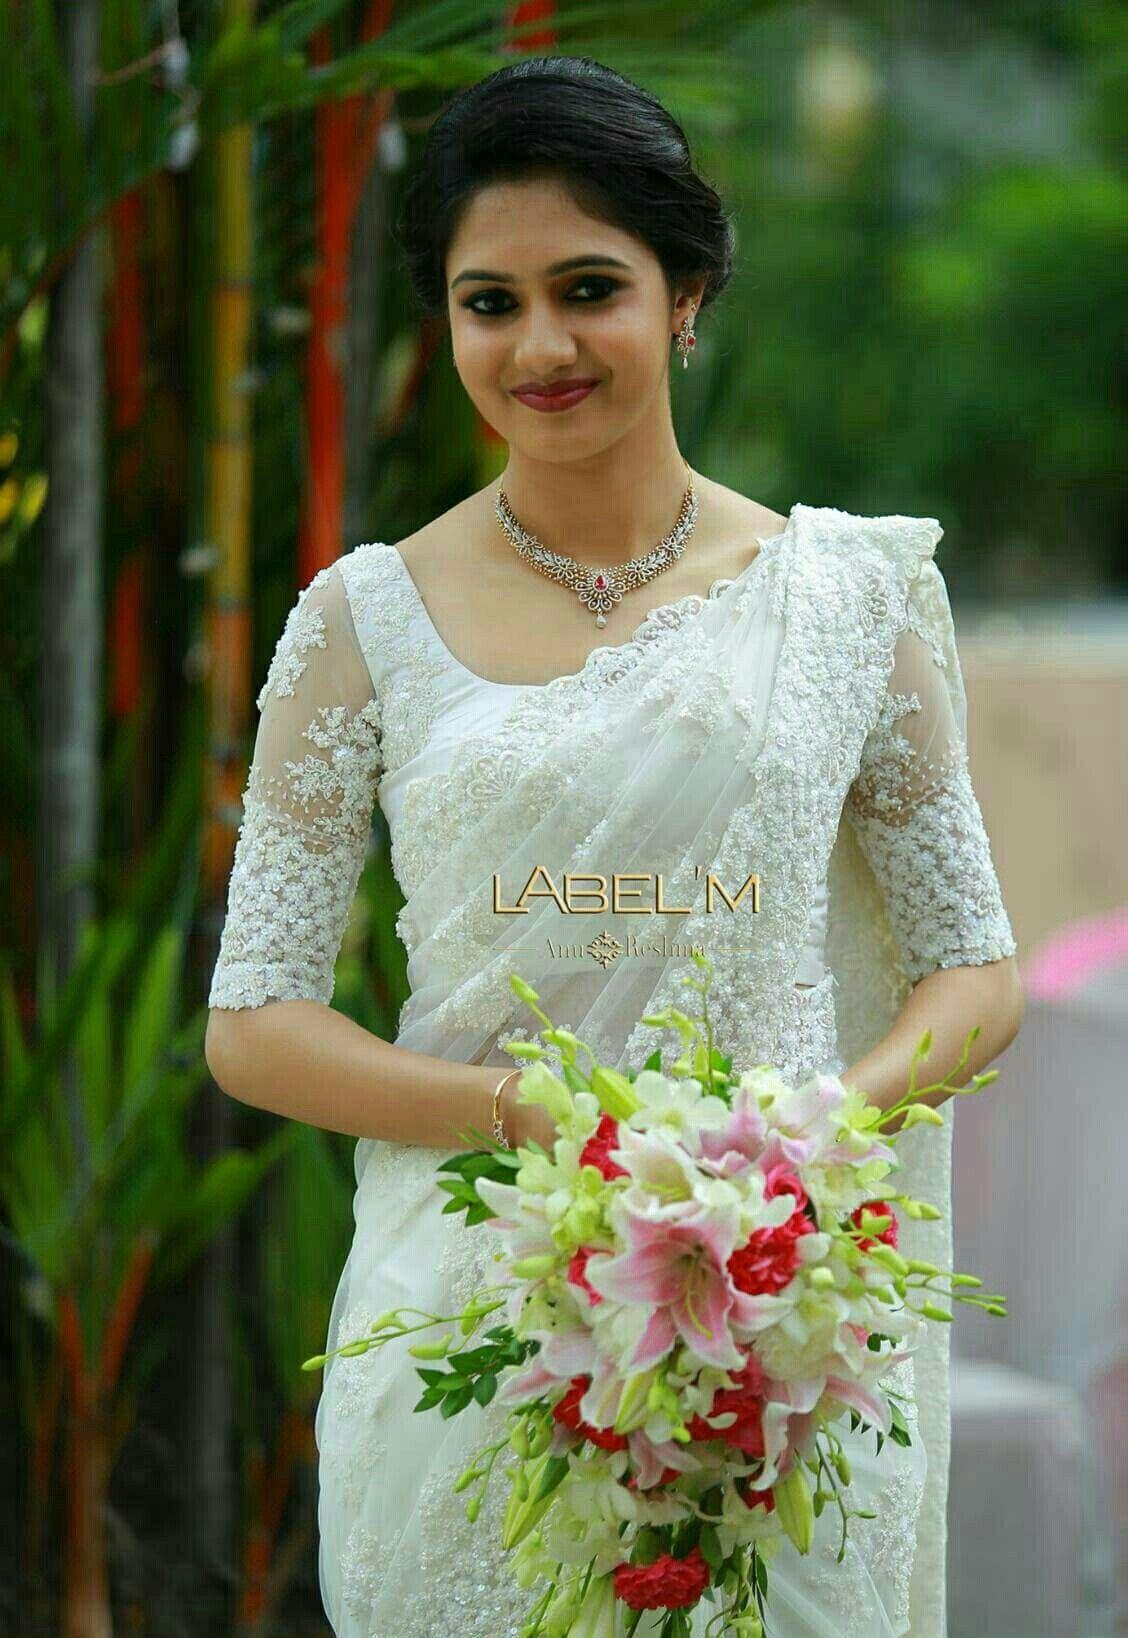 White Saree Christian Wedding Sarees White Indian Wedding Dress Christian Wedding Dress,Middle Aged Classy Summer Wedding Guest Dresses